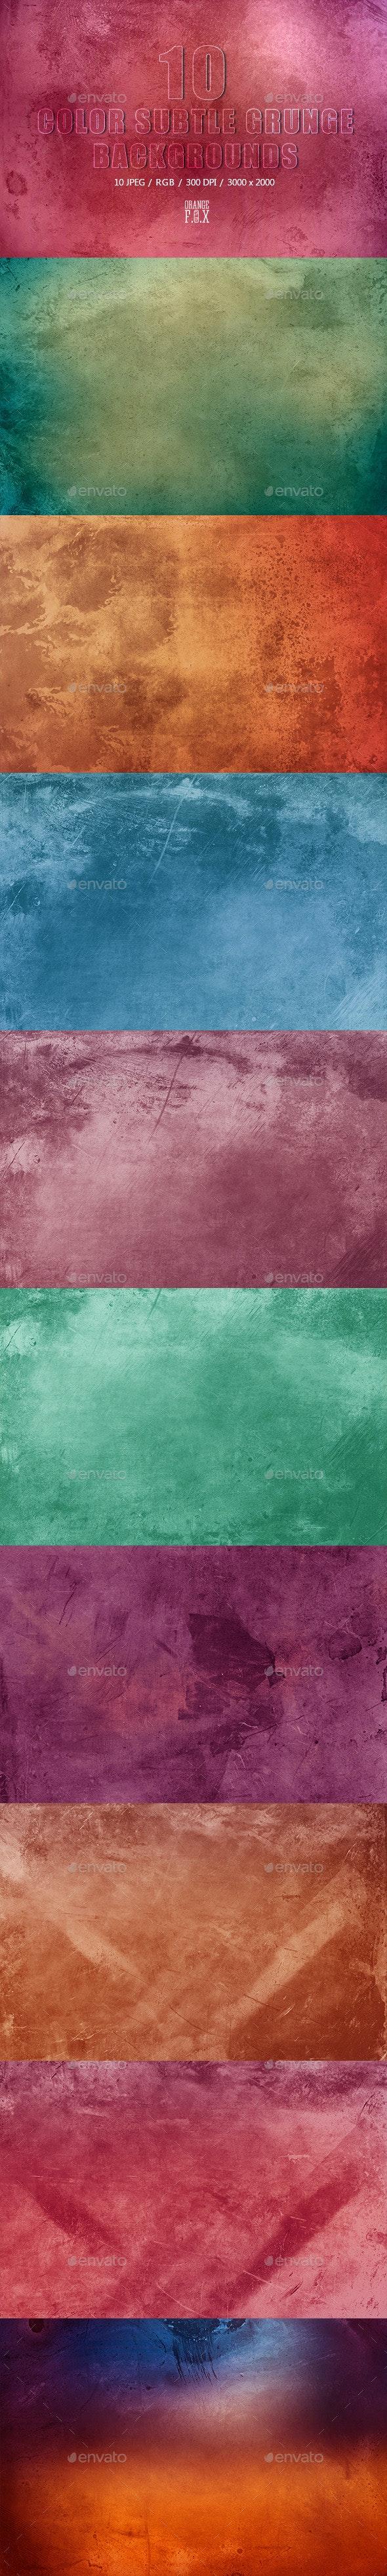 10 Color Subtle Grunge Backgrounds - Abstract Backgrounds